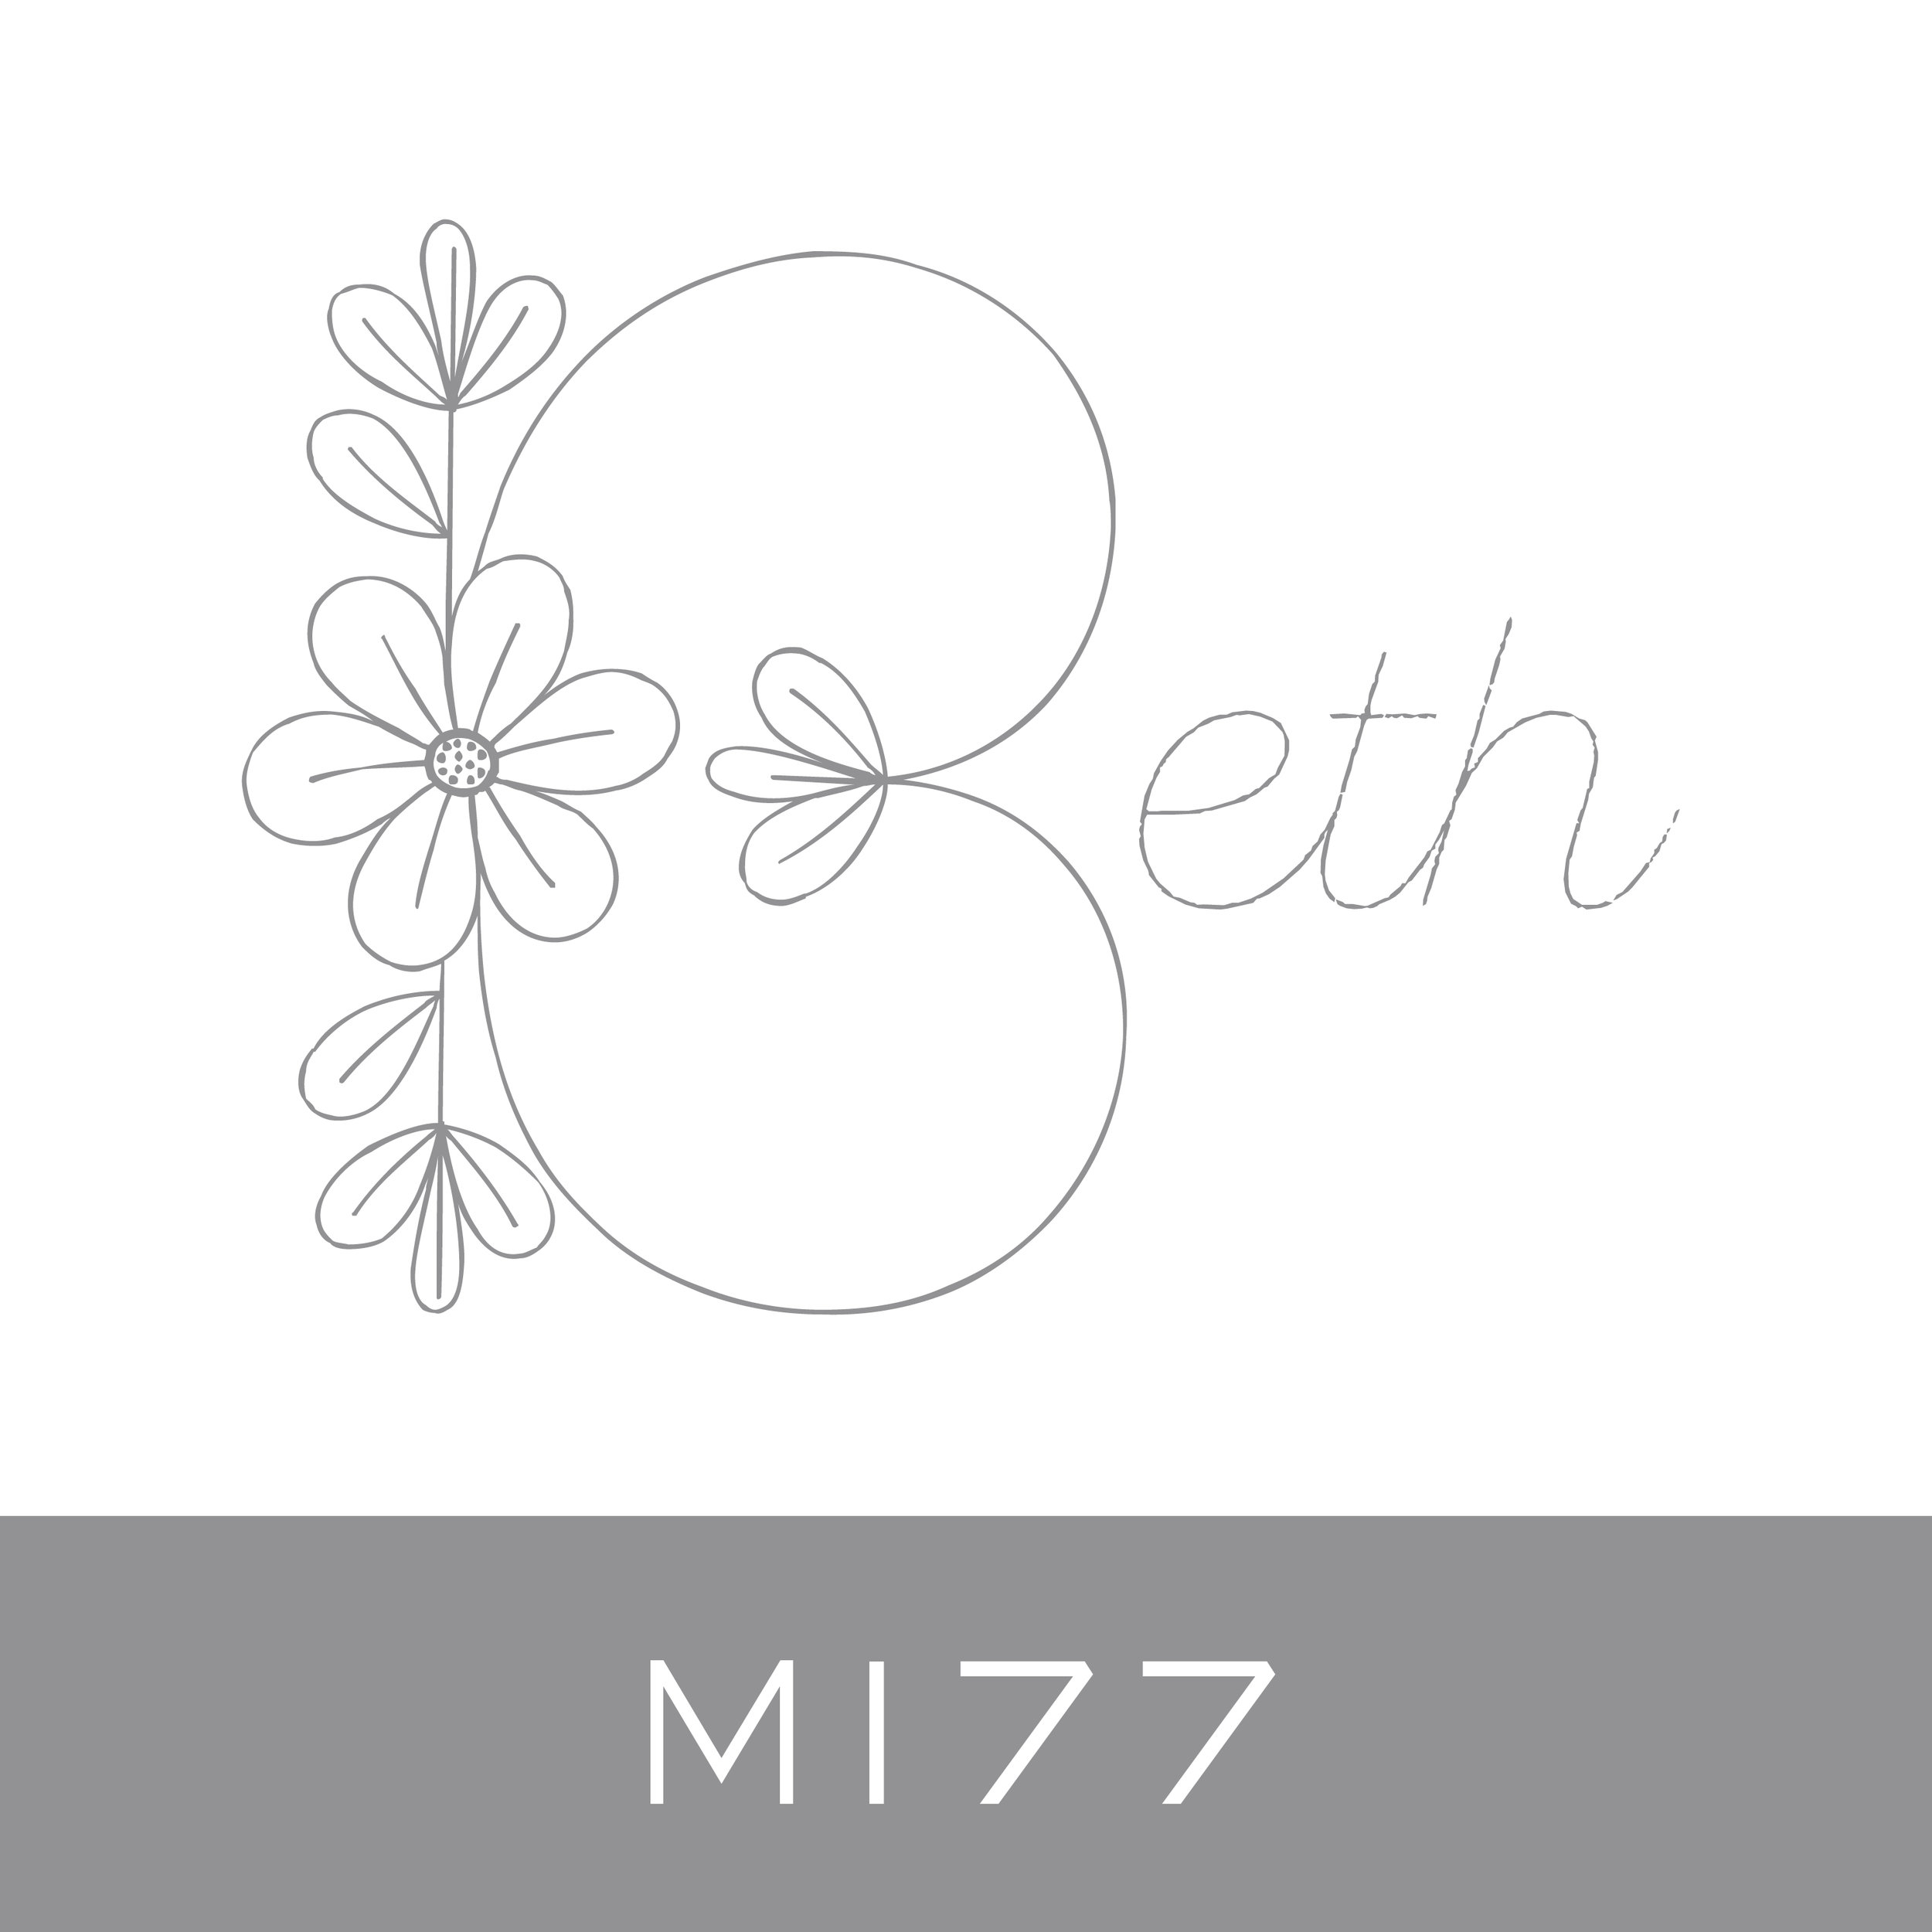 M177.jpg